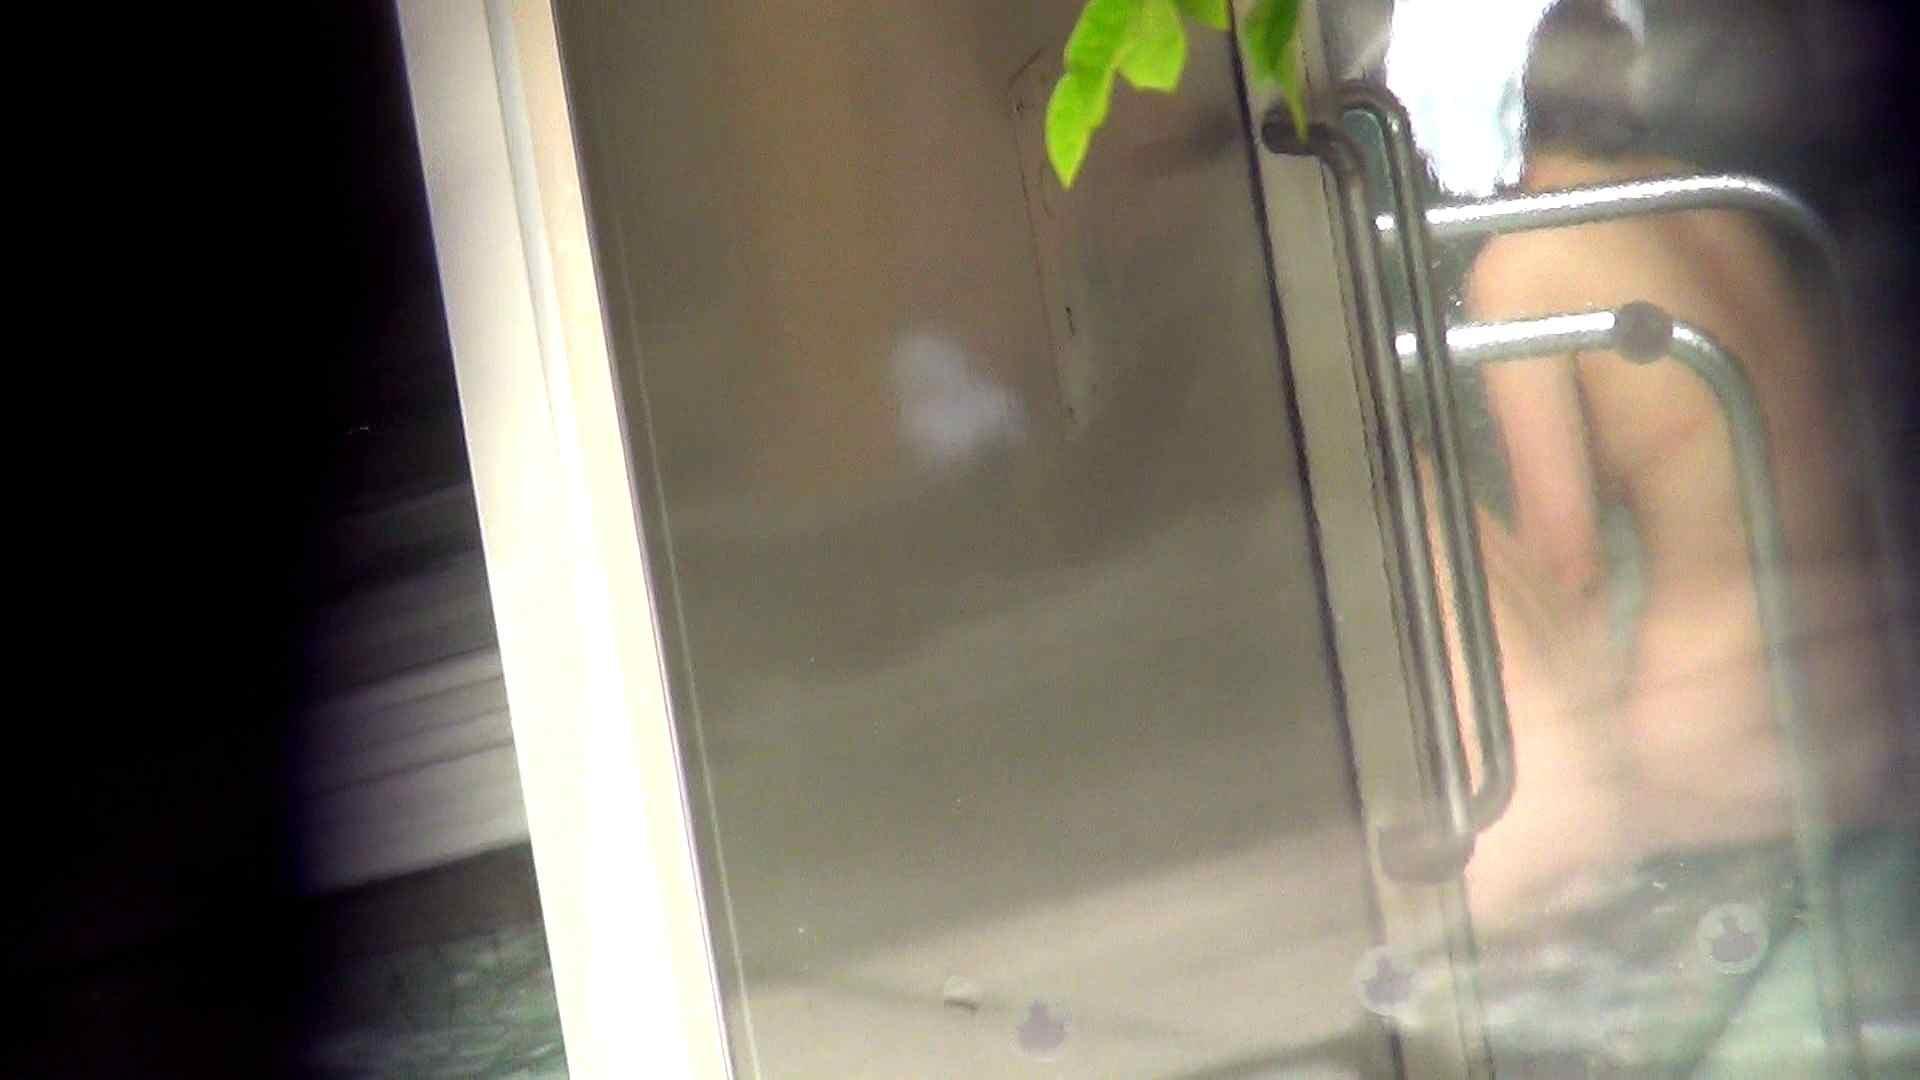 Aquaな露天風呂Vol.292 OLセックス 覗き性交動画流出 106画像 17